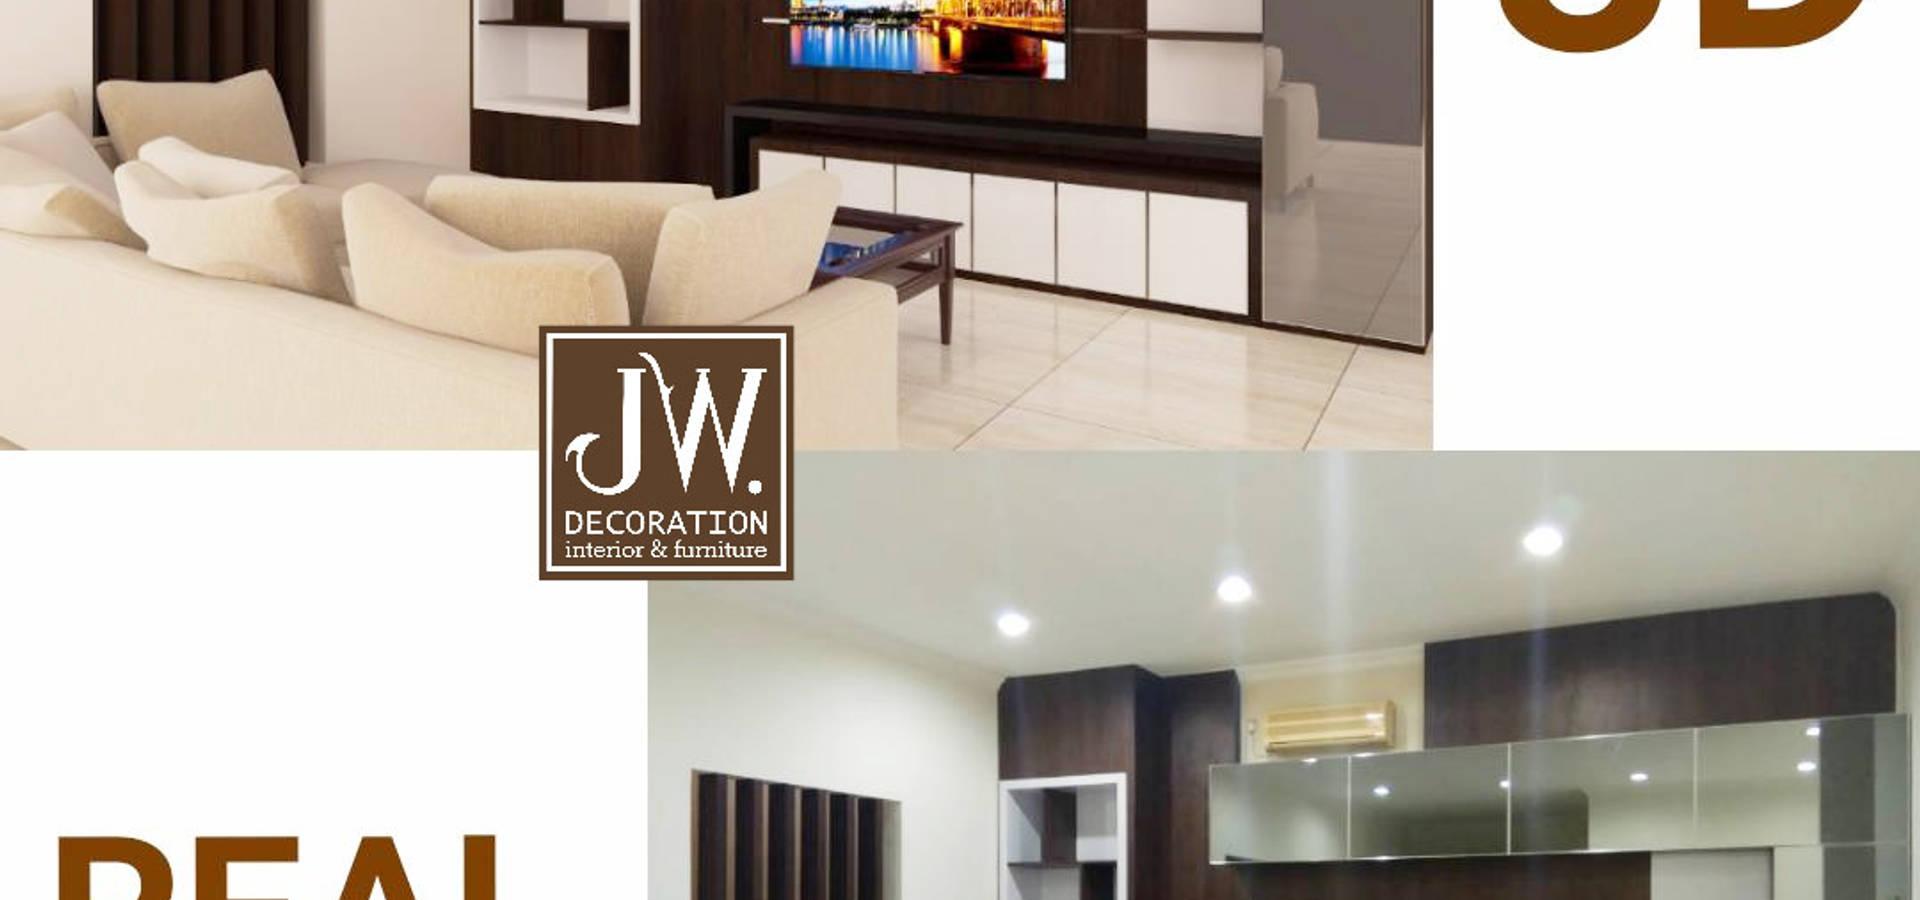 JW Decoration